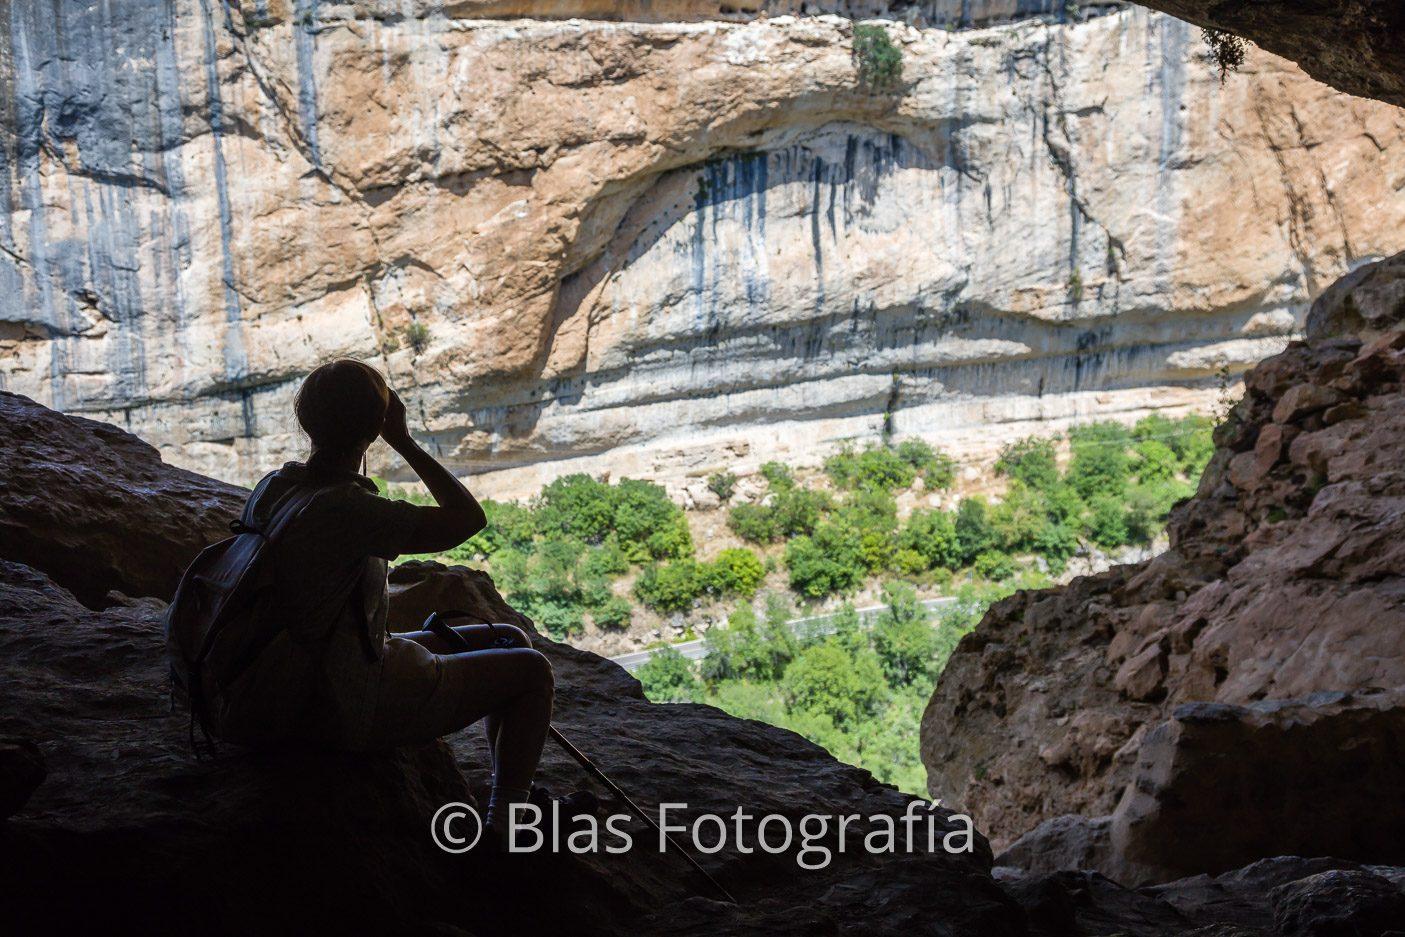 Cueva de la Ramera